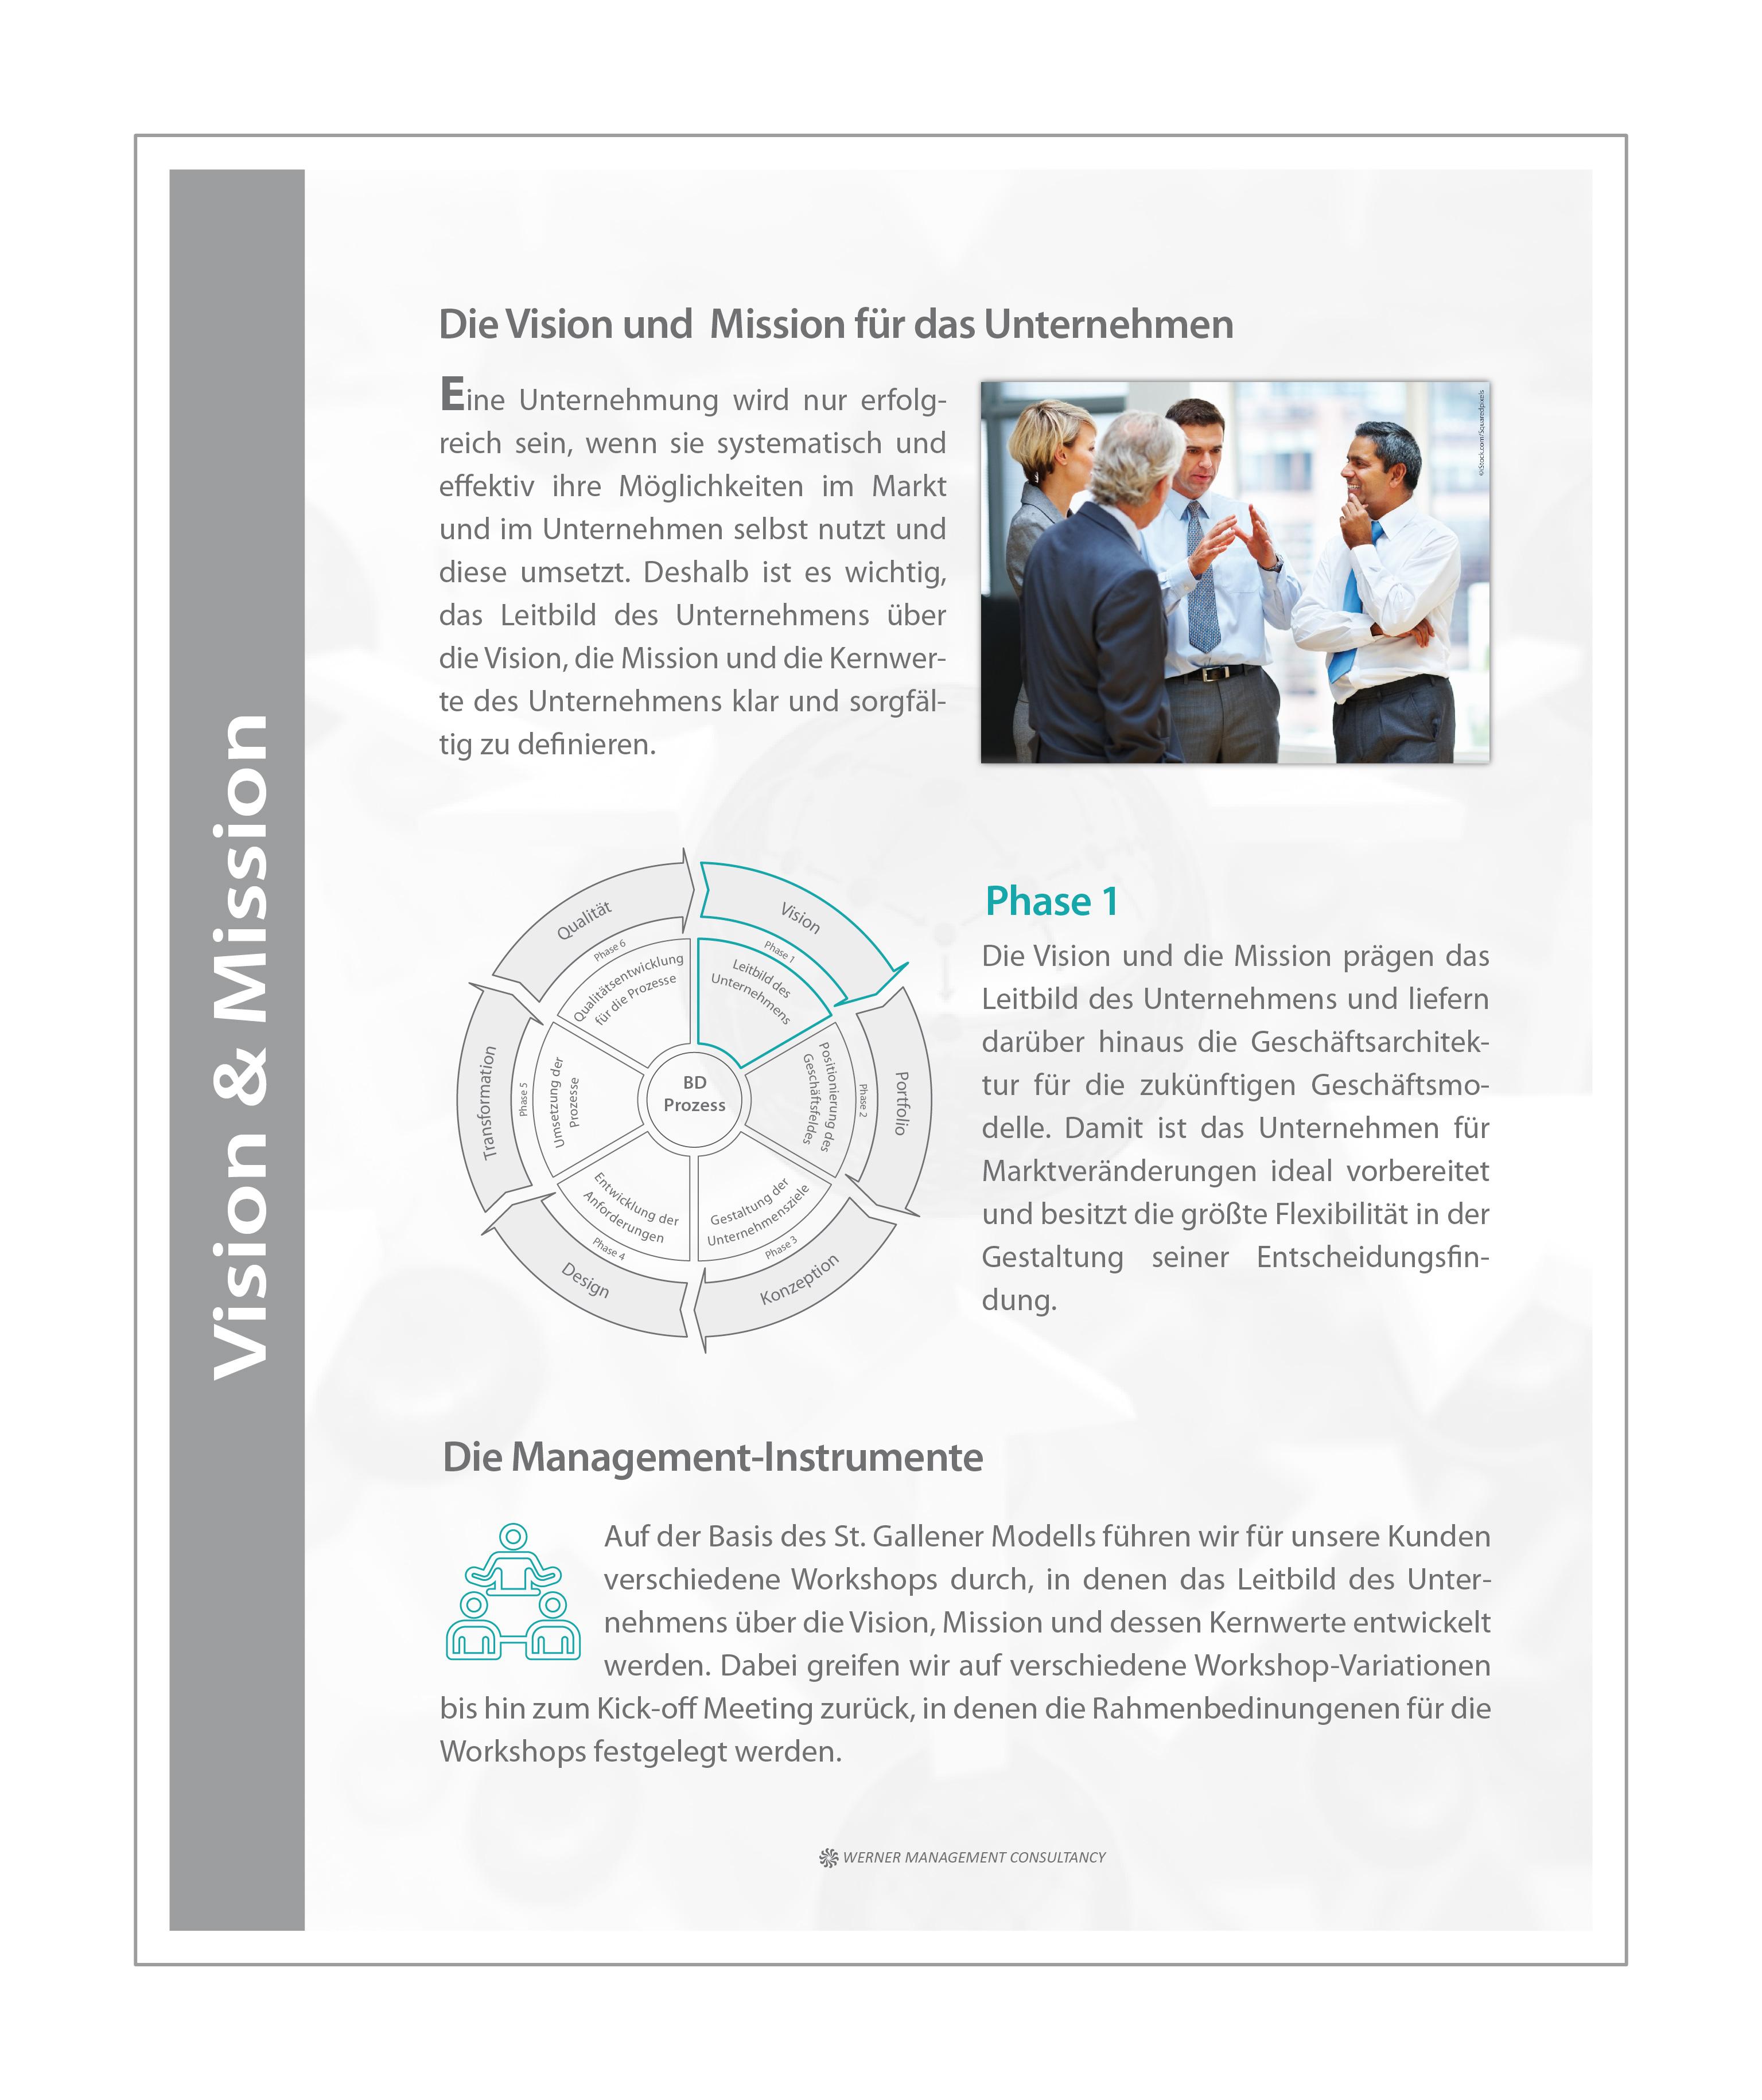 WMC Broschüre Business Development Phase-1 Prozess